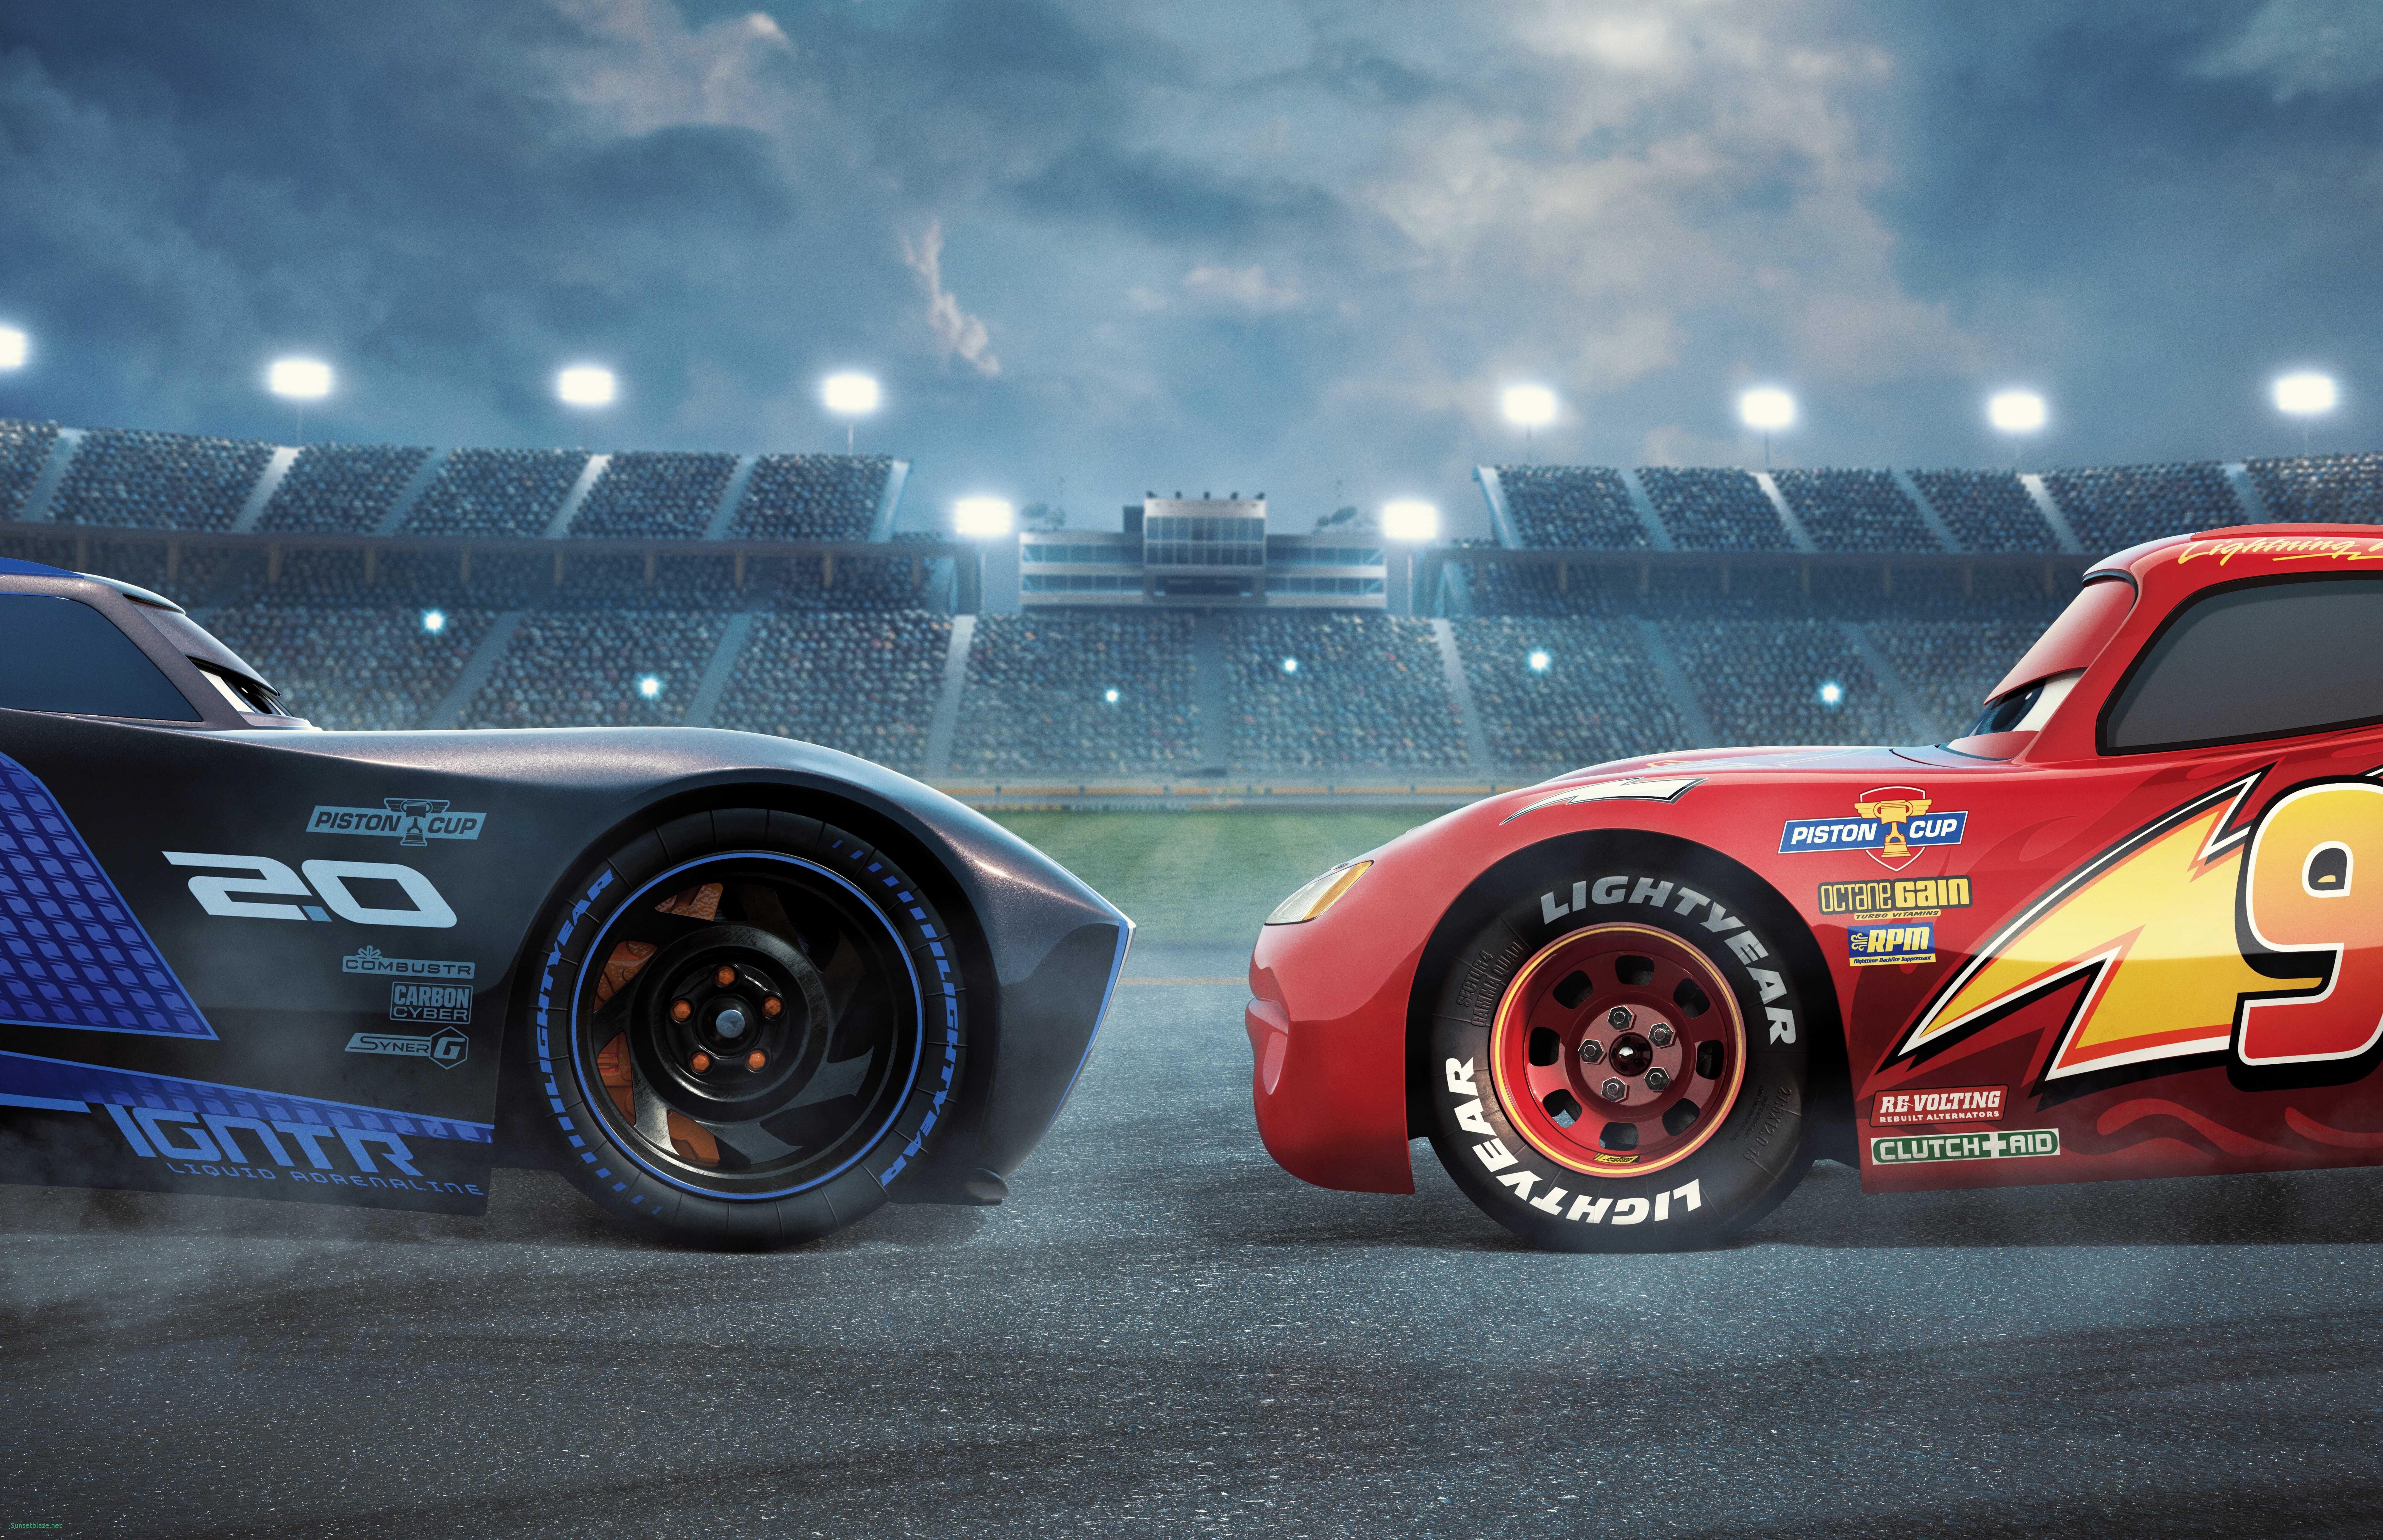 Car Clutch Wallpapers For Iphone Disney Cars Wallpaper Lightning Mcqueen Mcqueen Cars 3